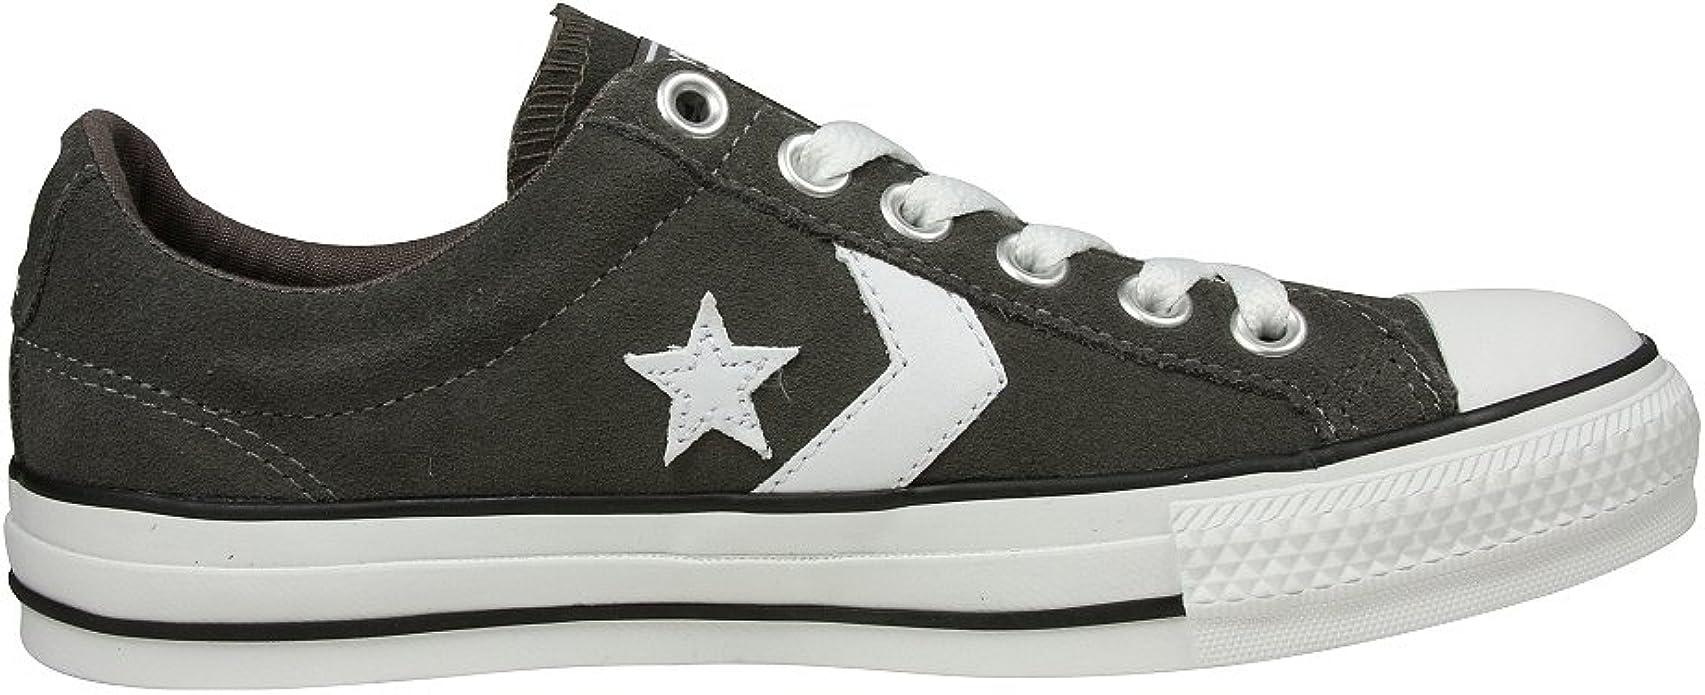 Converse Star Player EV Ox | Shoes